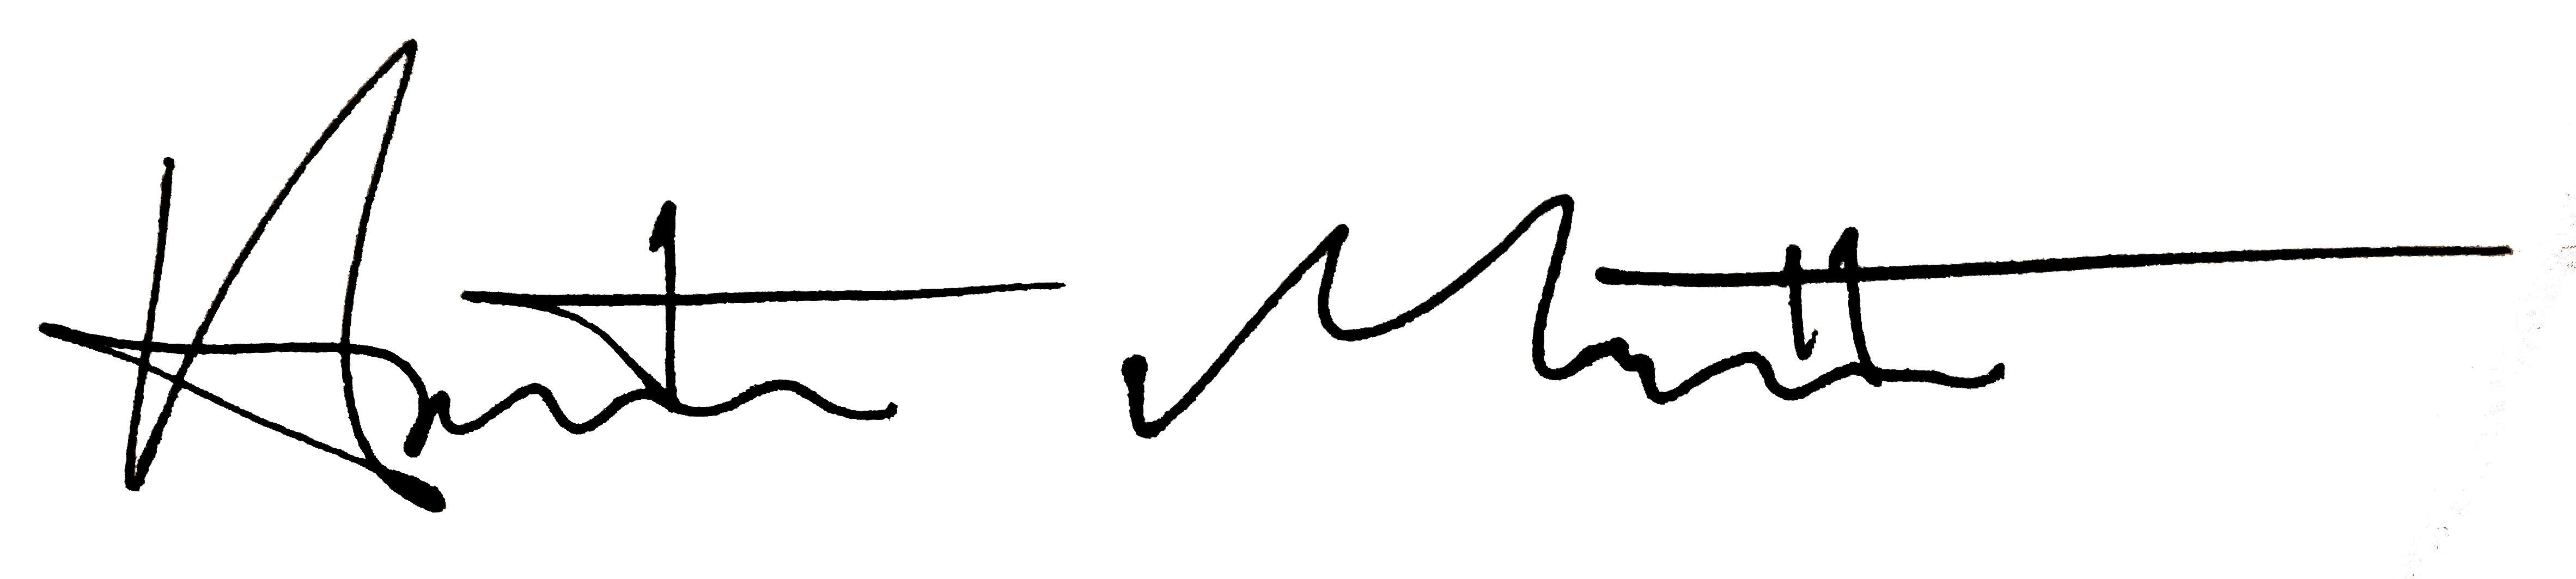 Austin Matthew's Signature